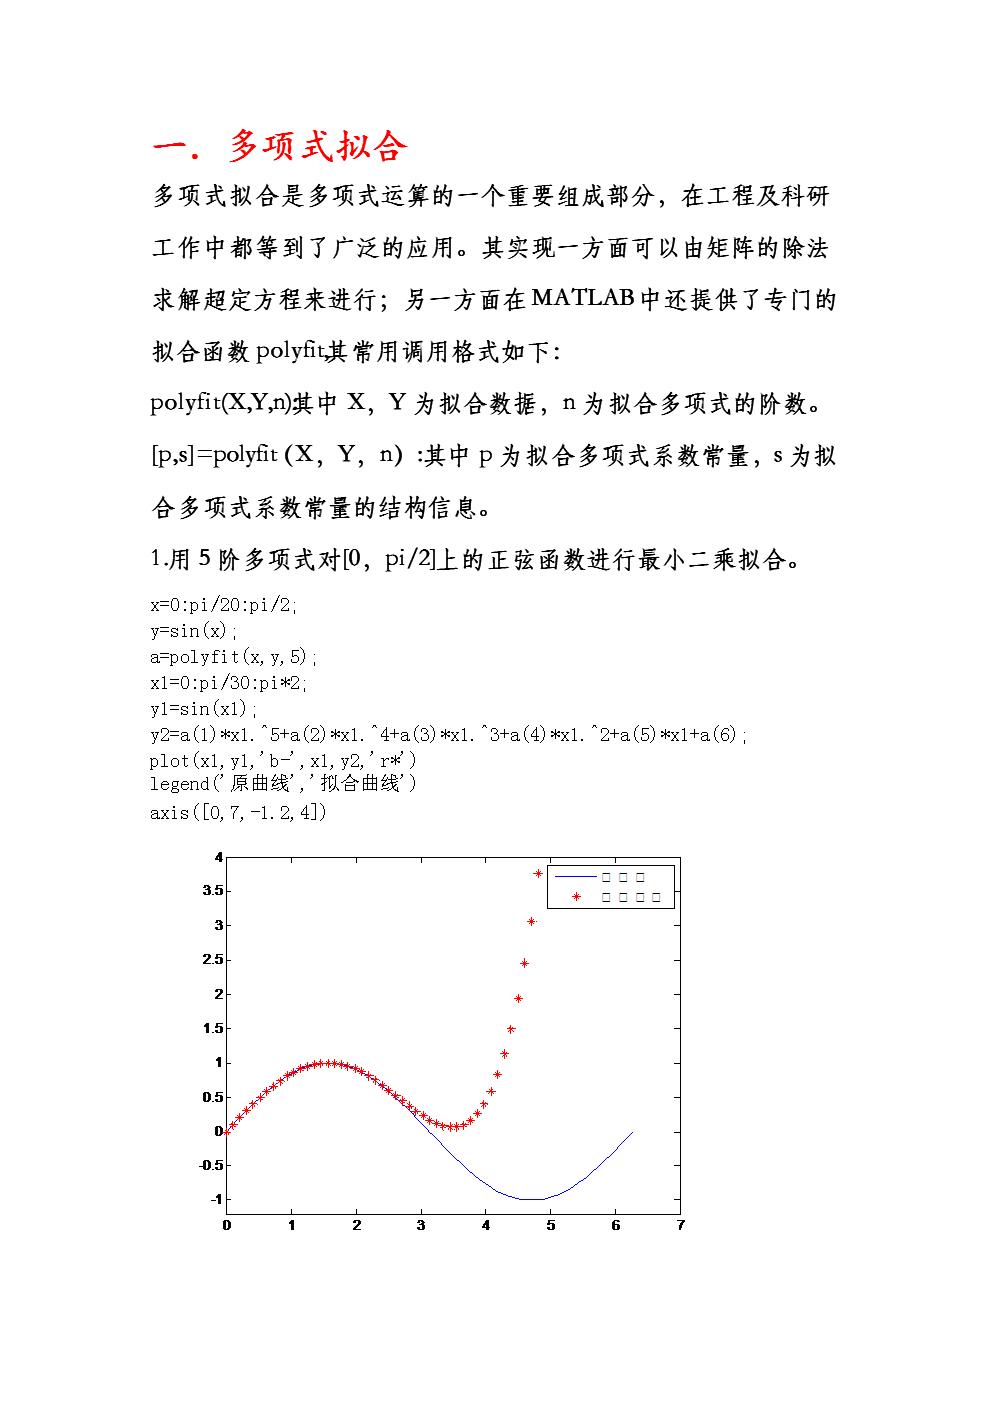 MATLAB程序设计图纸.doc